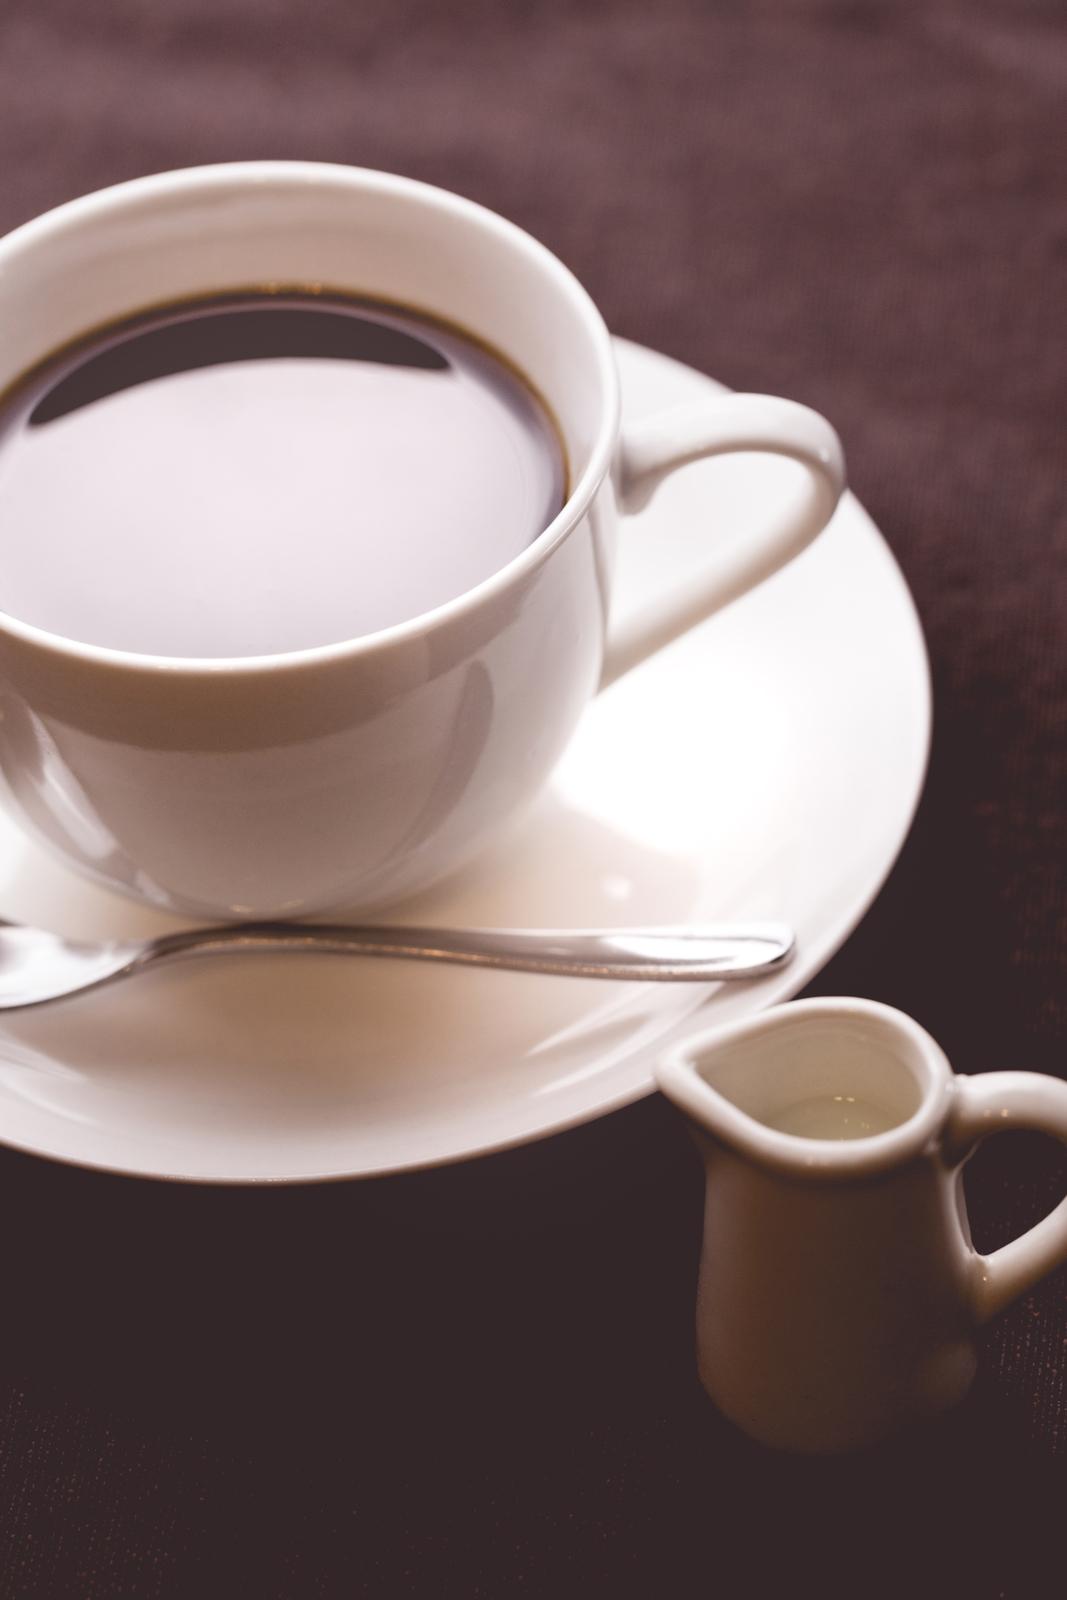 coffee20160715025404-thumb-autox1600-24859